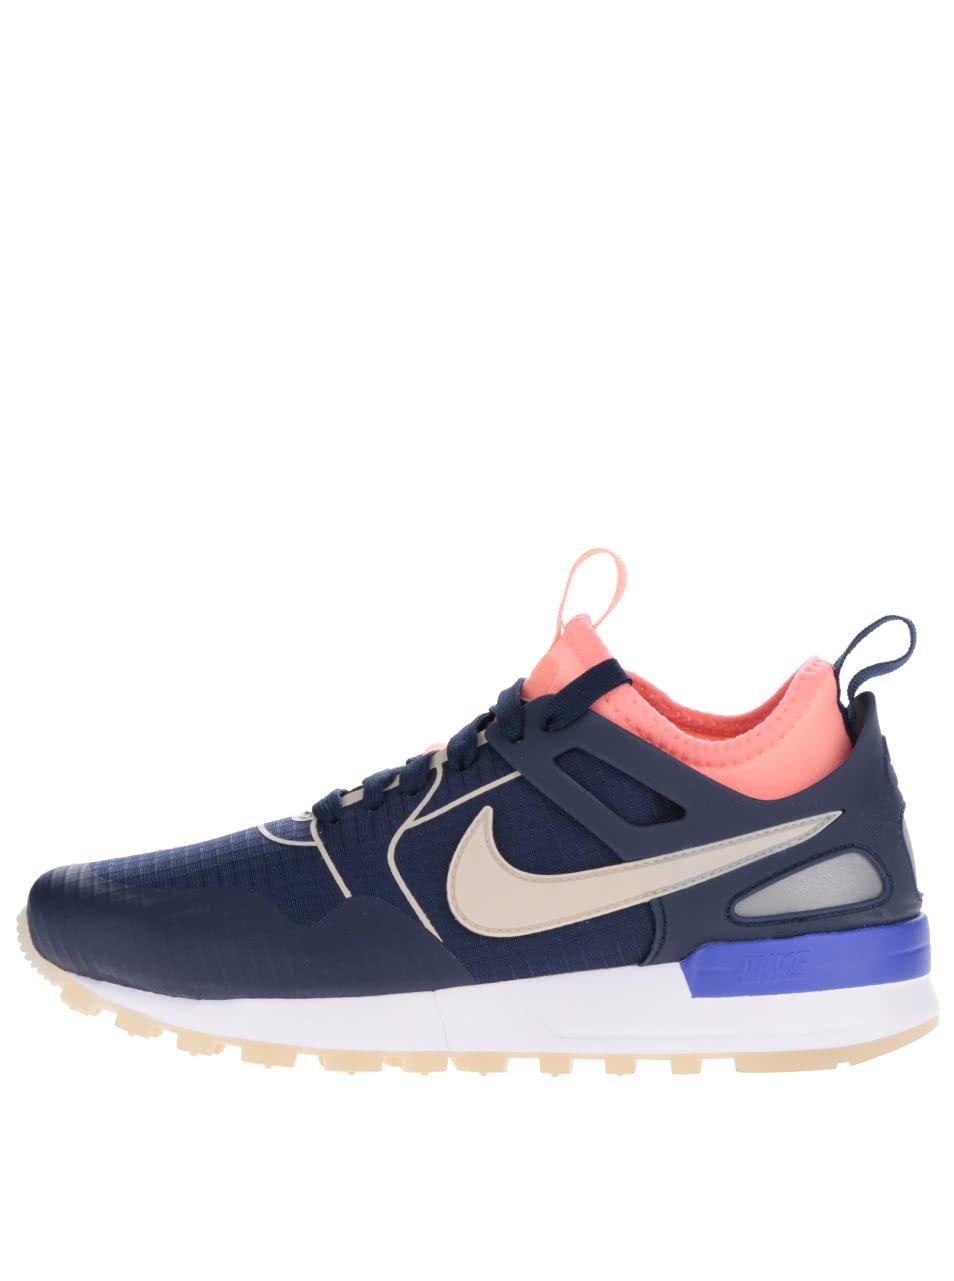 Oranžovo-modré dámské tenisky Nike Air Pegasus